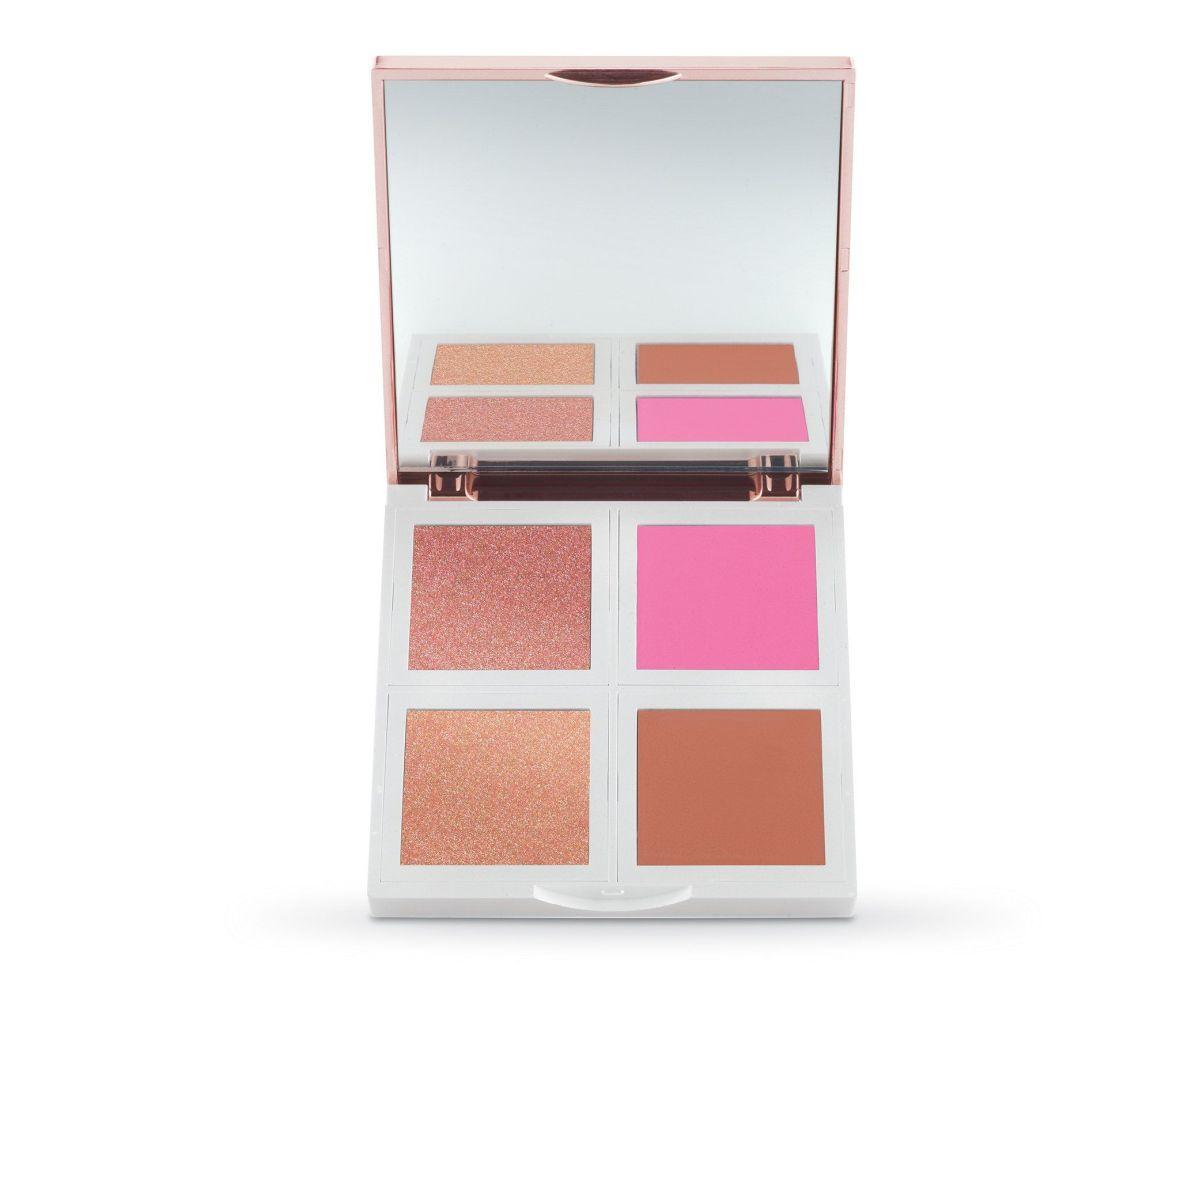 Josie Maran Vibrancy Argan Oil Fresh Face Paint Palette